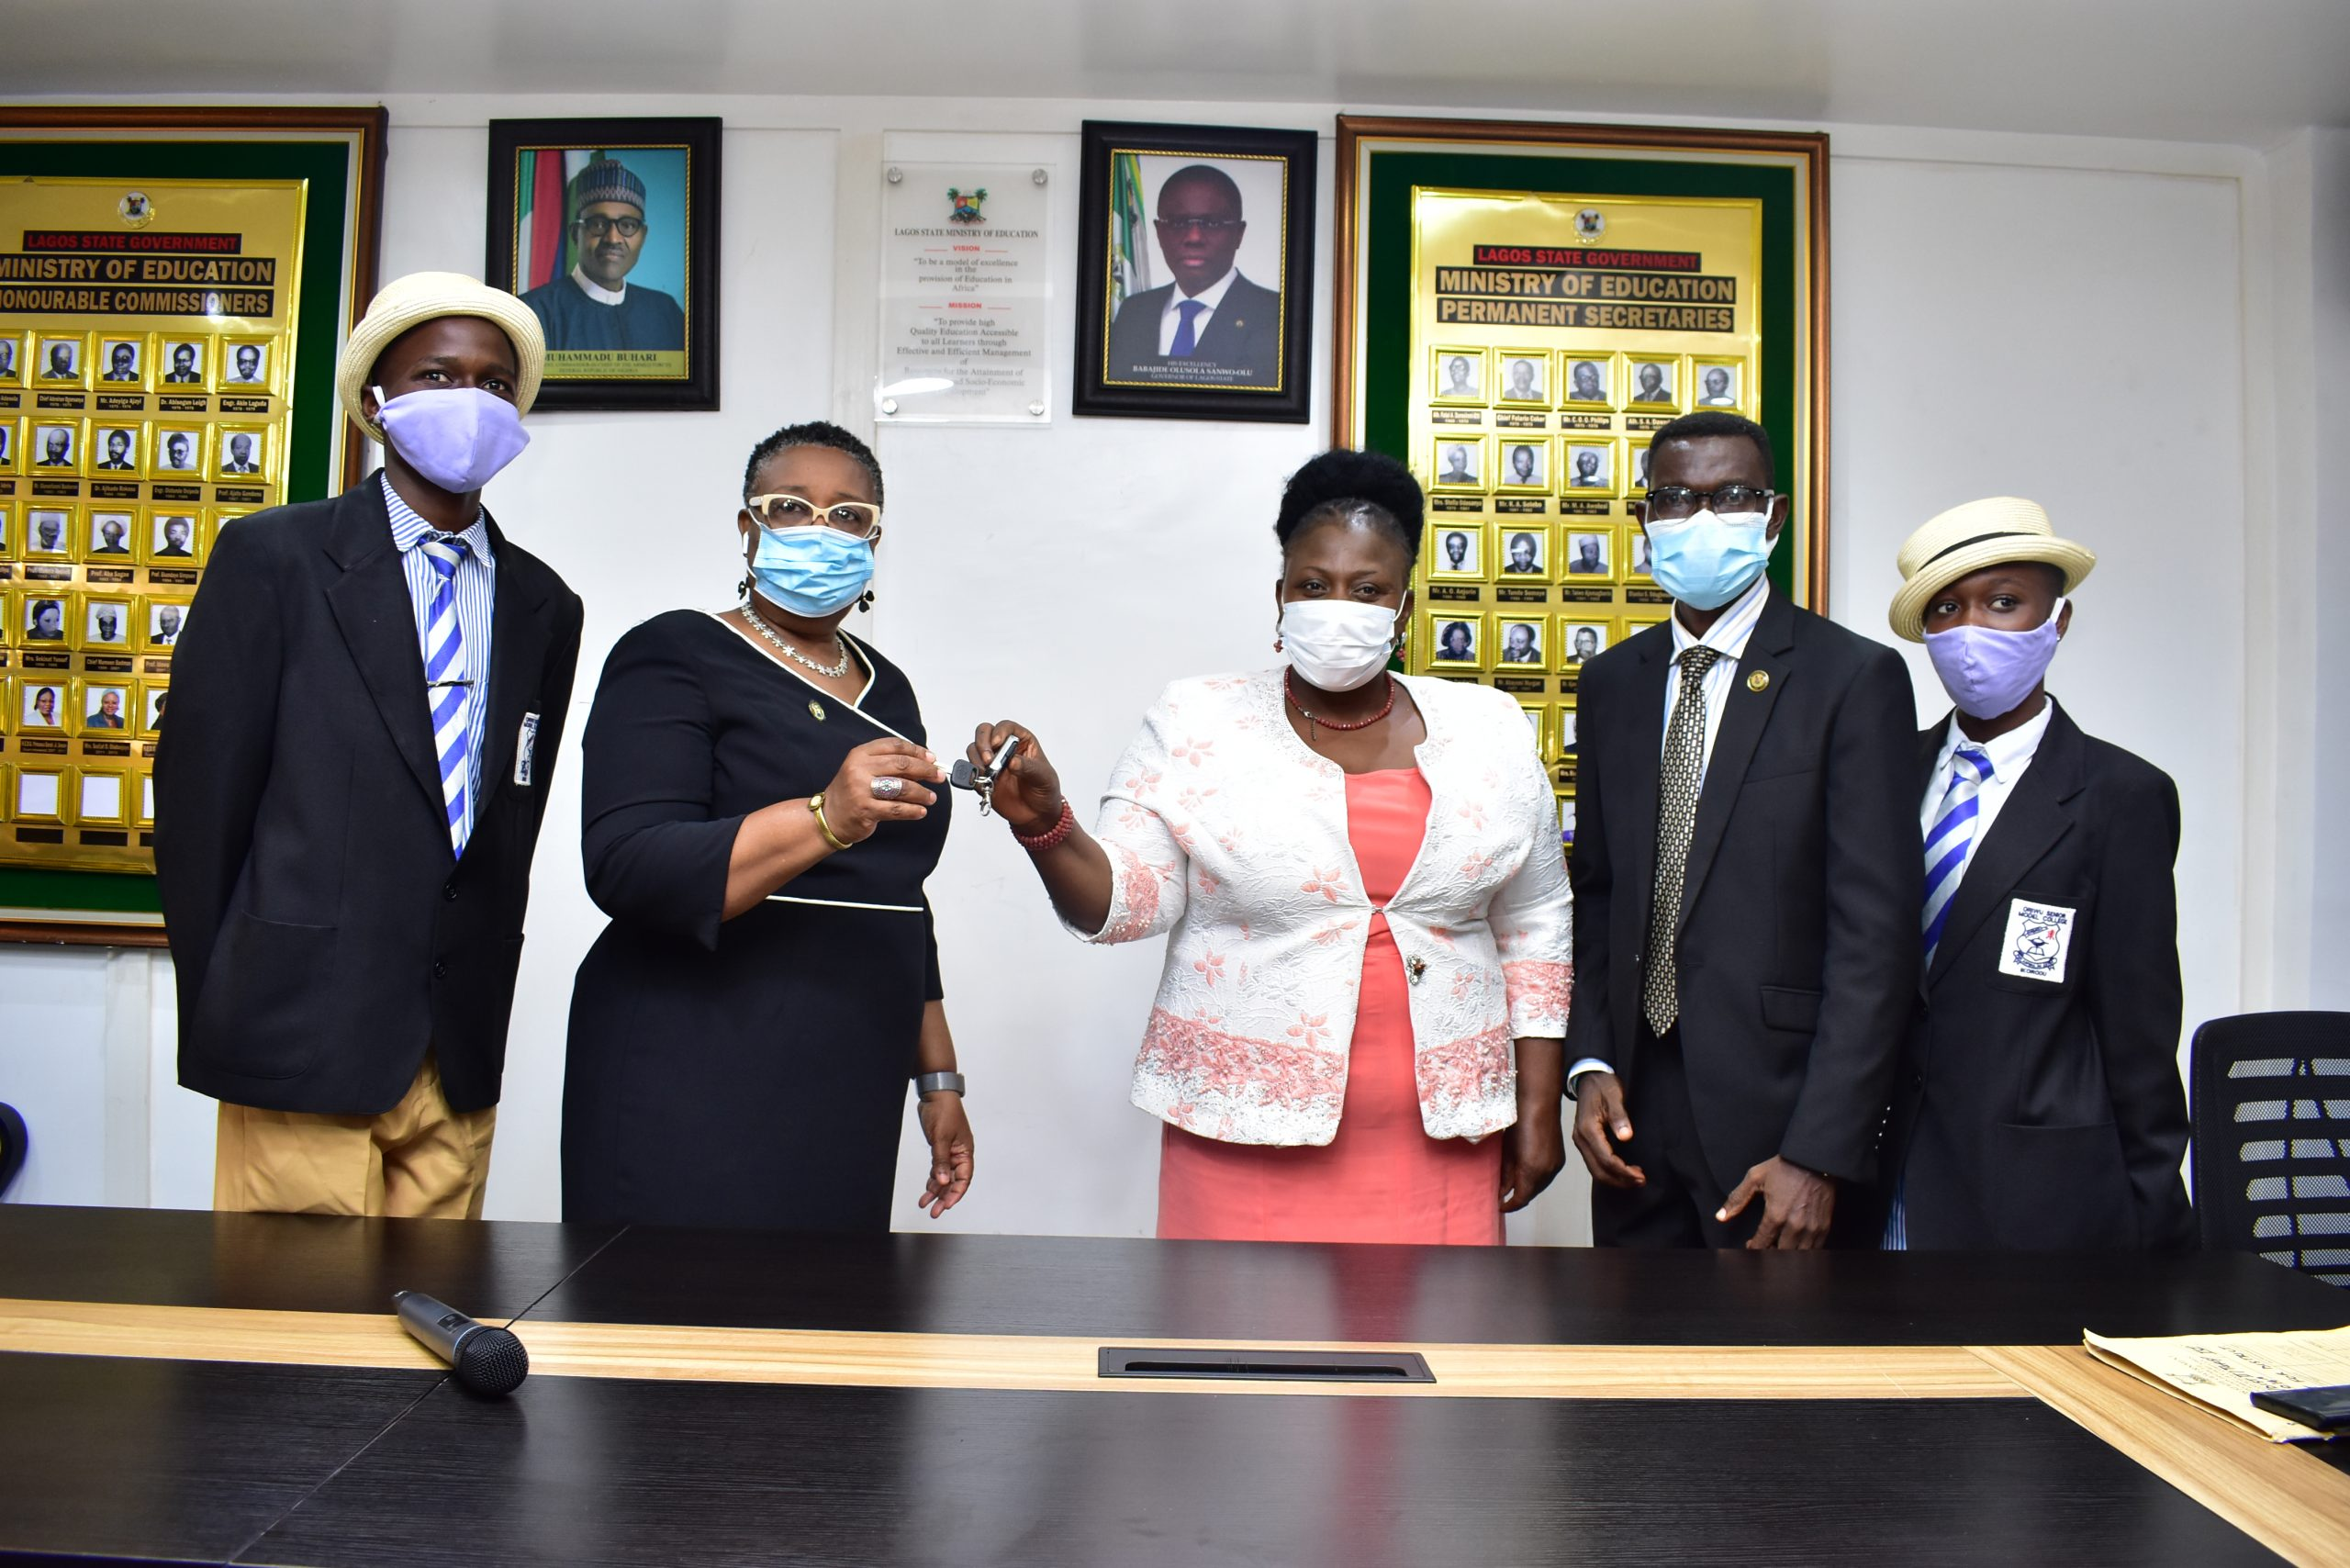 Oriwu Senior Model College Students with Honourable Commissioner for Education, Mrs. Folasade Adefisayo